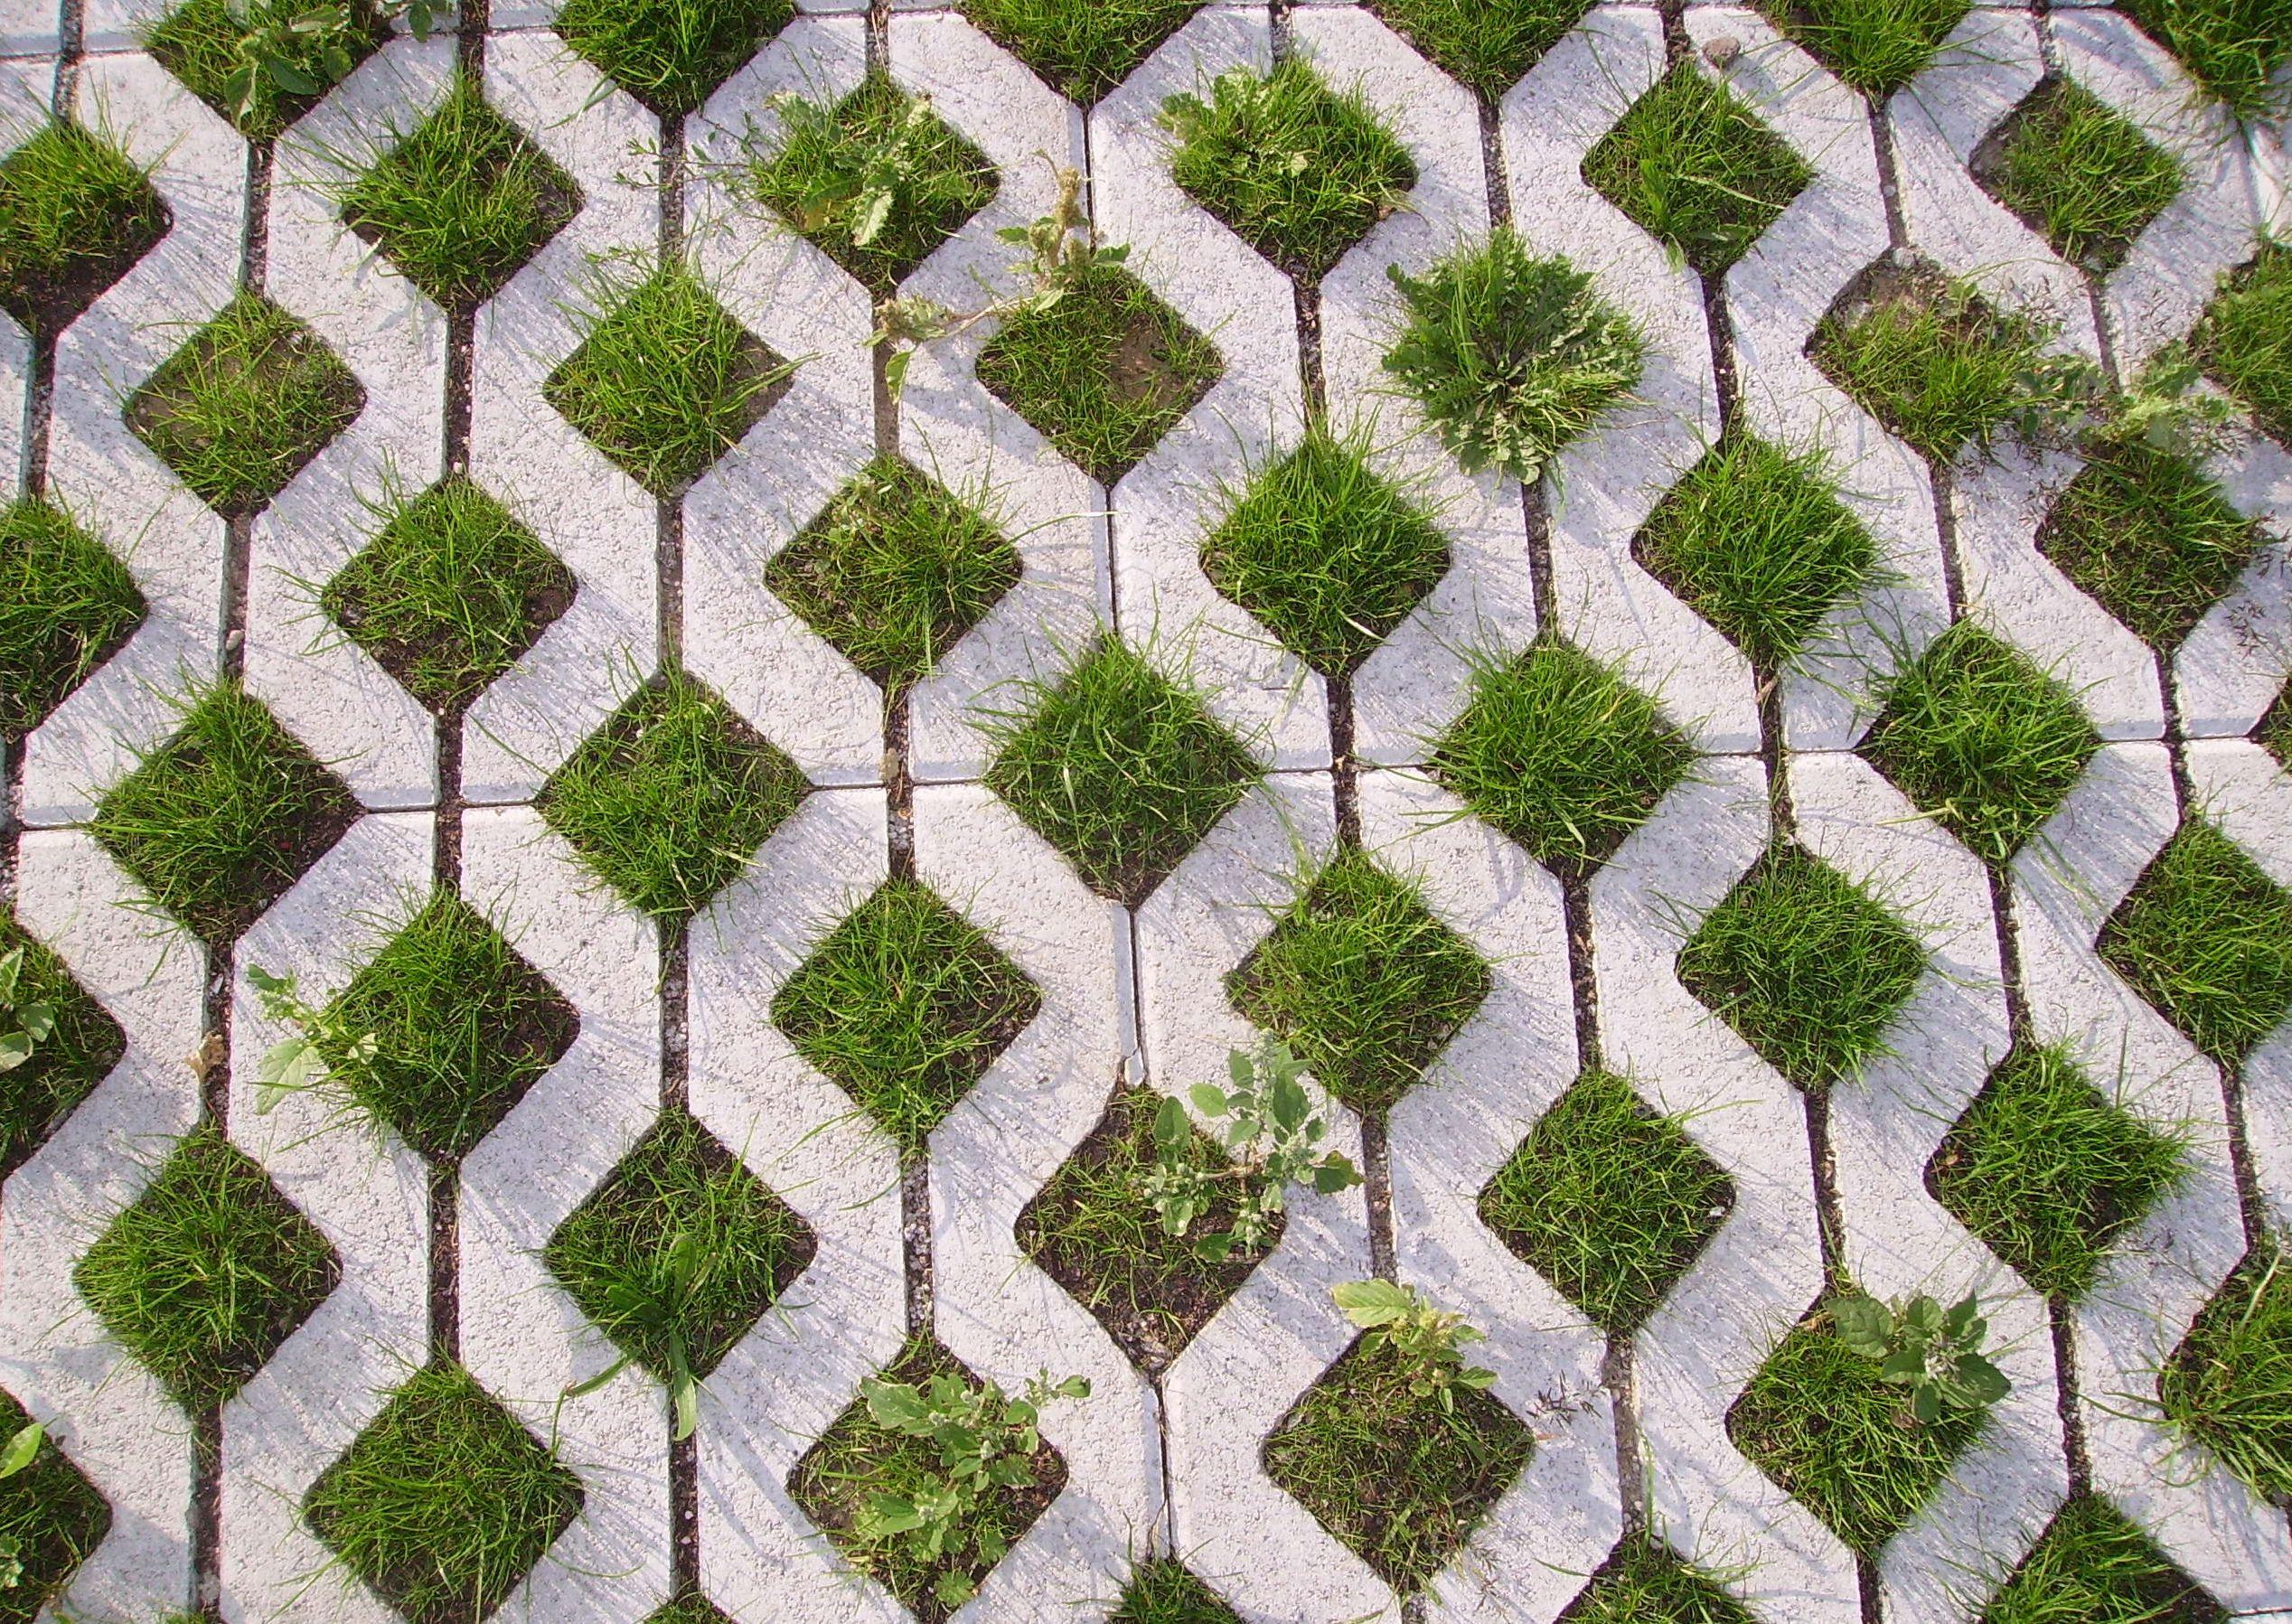 landscape architecture brick paving - Google Search